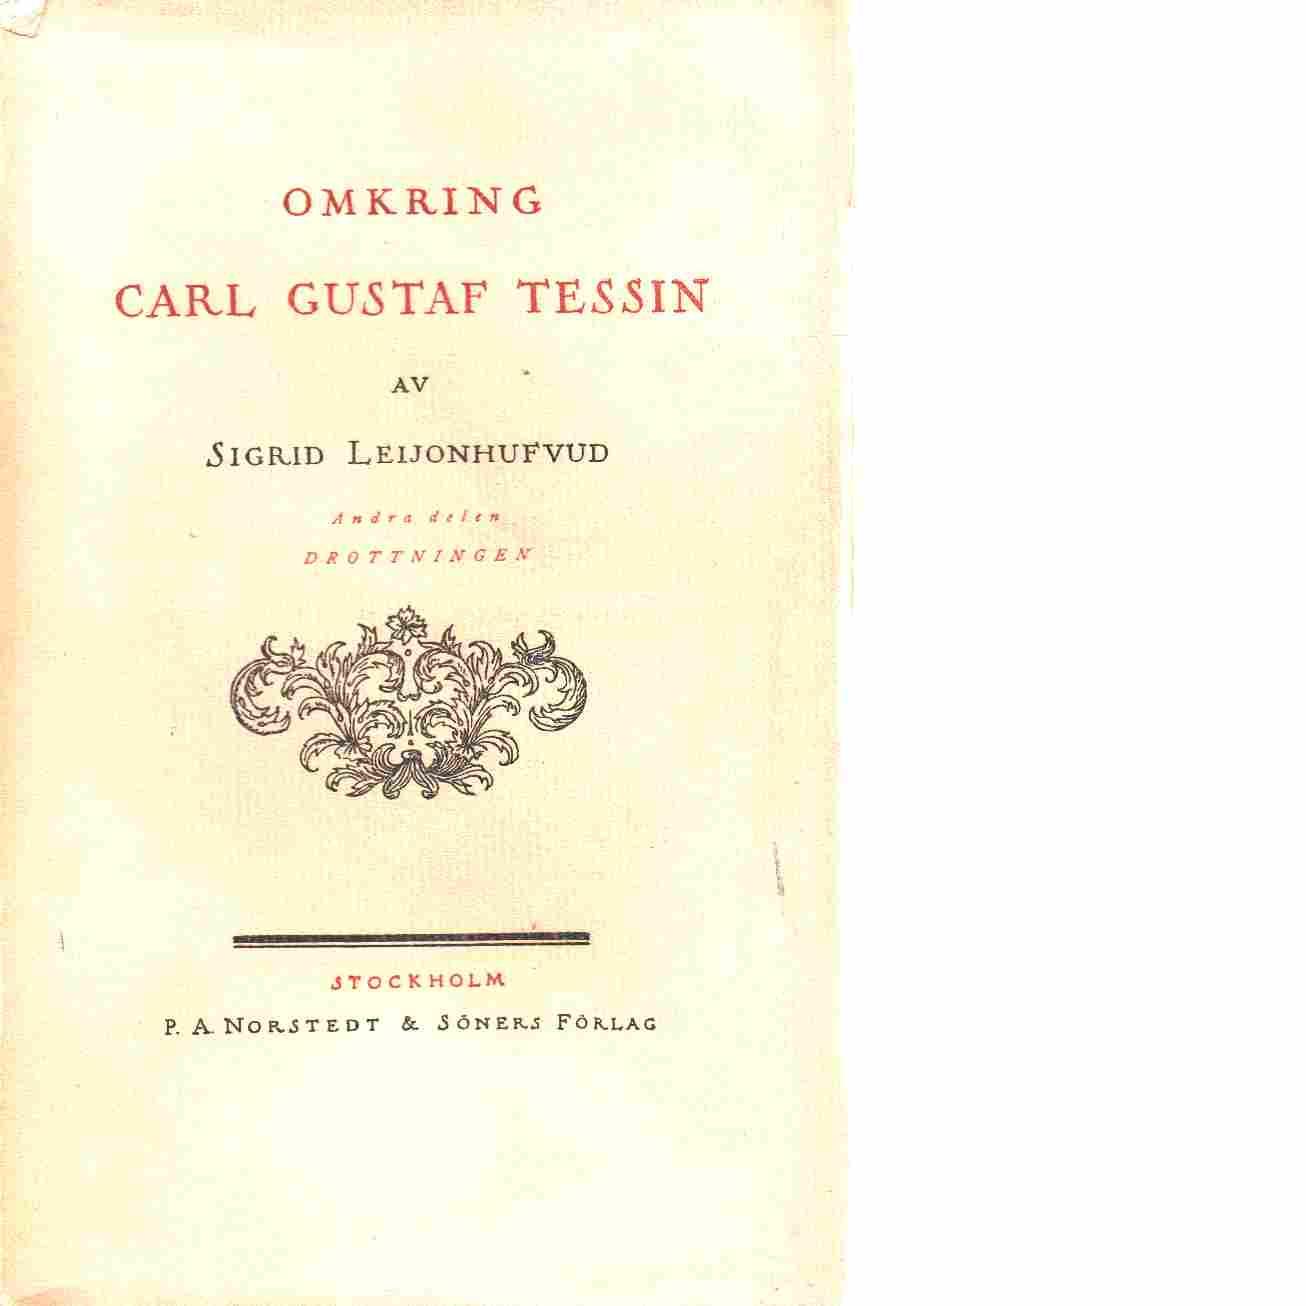 Omkring Carl Gustaf Tessin. del 2, Drottningen - Leijonhufvud, Sigrid